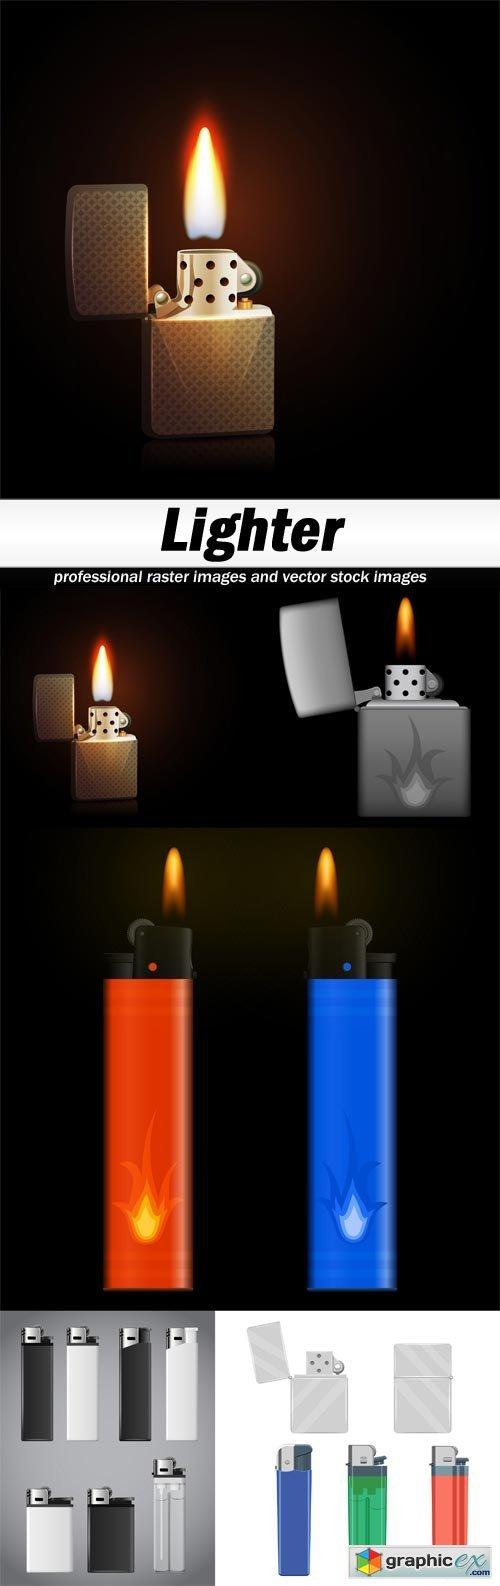 download the acid lighter - photo #34